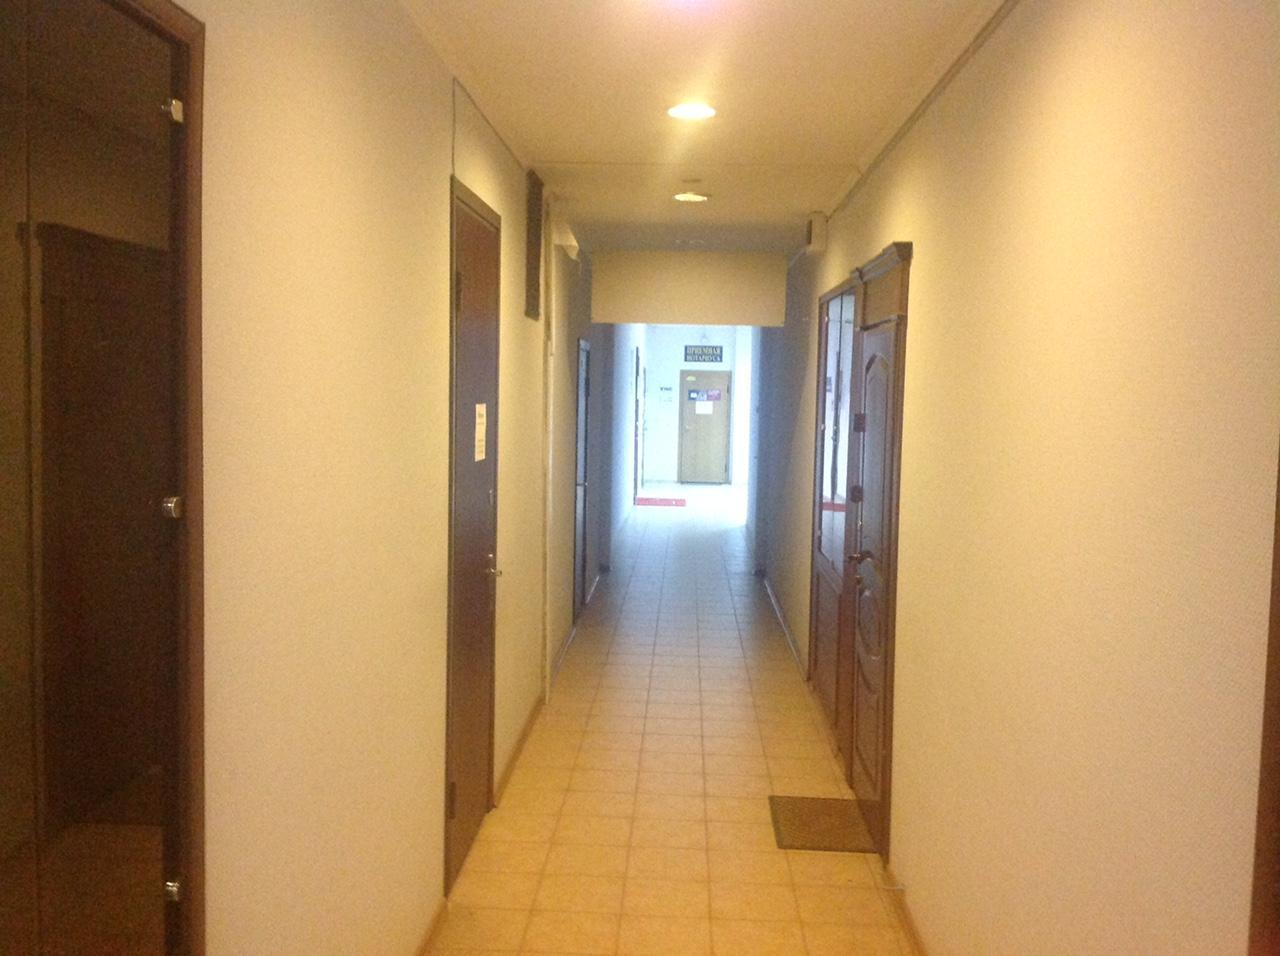 Продам офис в многоквартирном доме Харьков, Отакара Яроша ул. 3